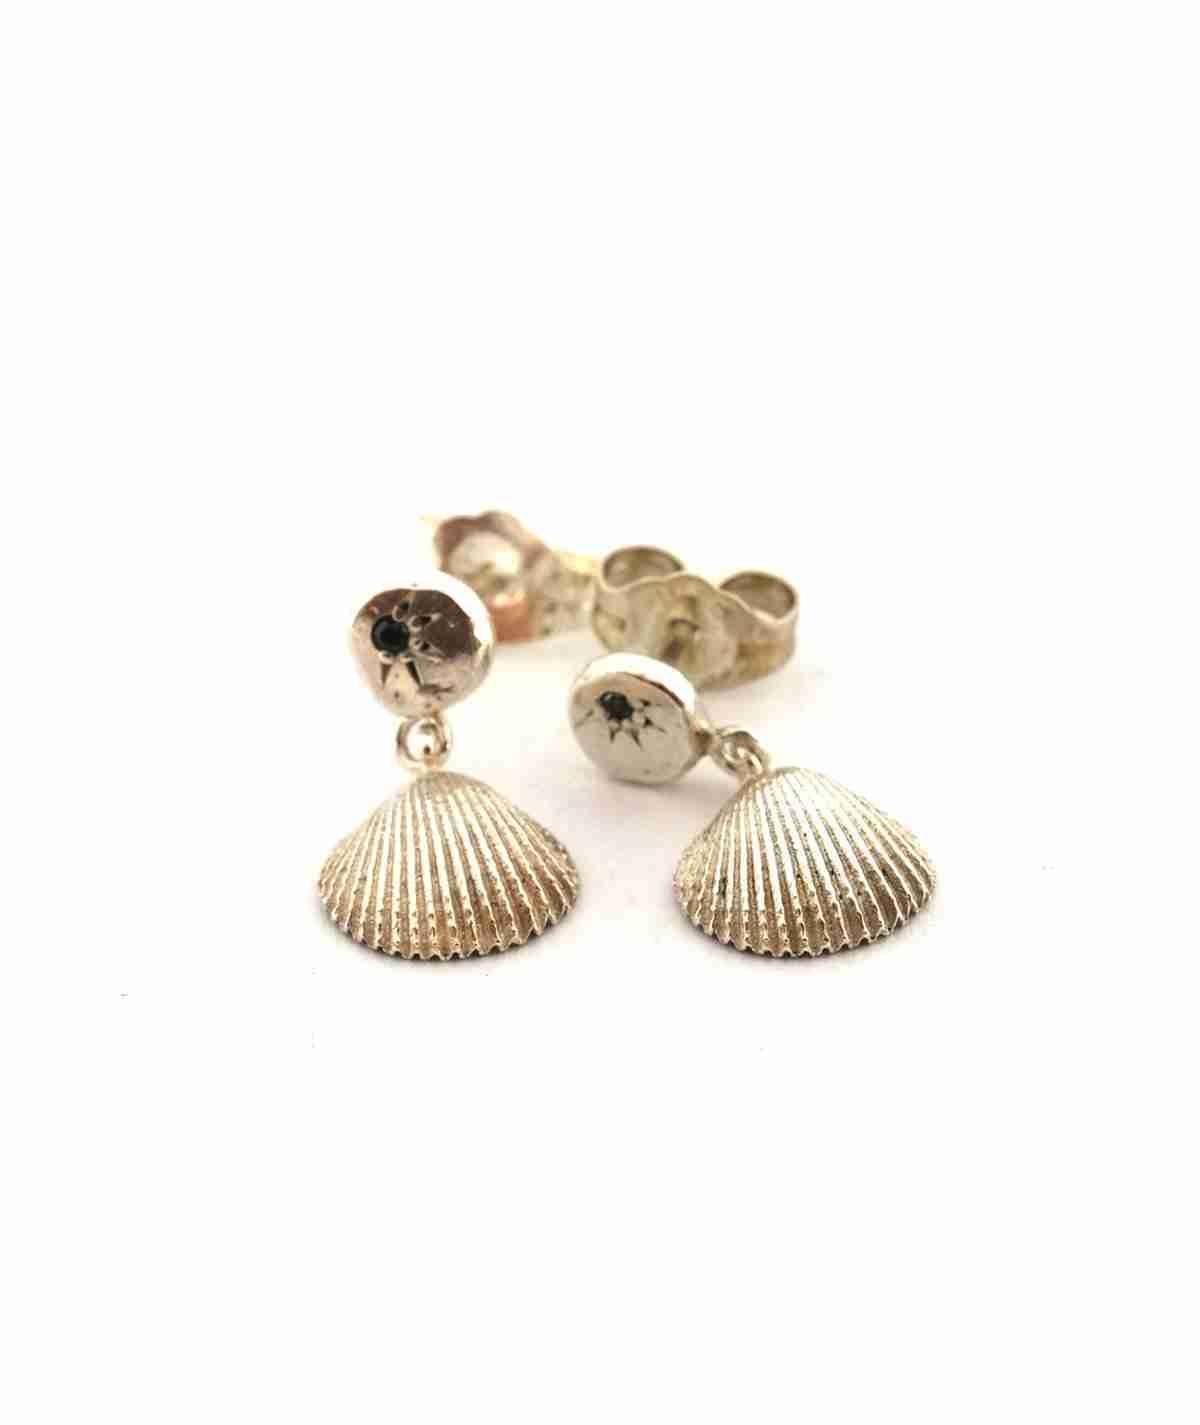 silver seashell stud earrings